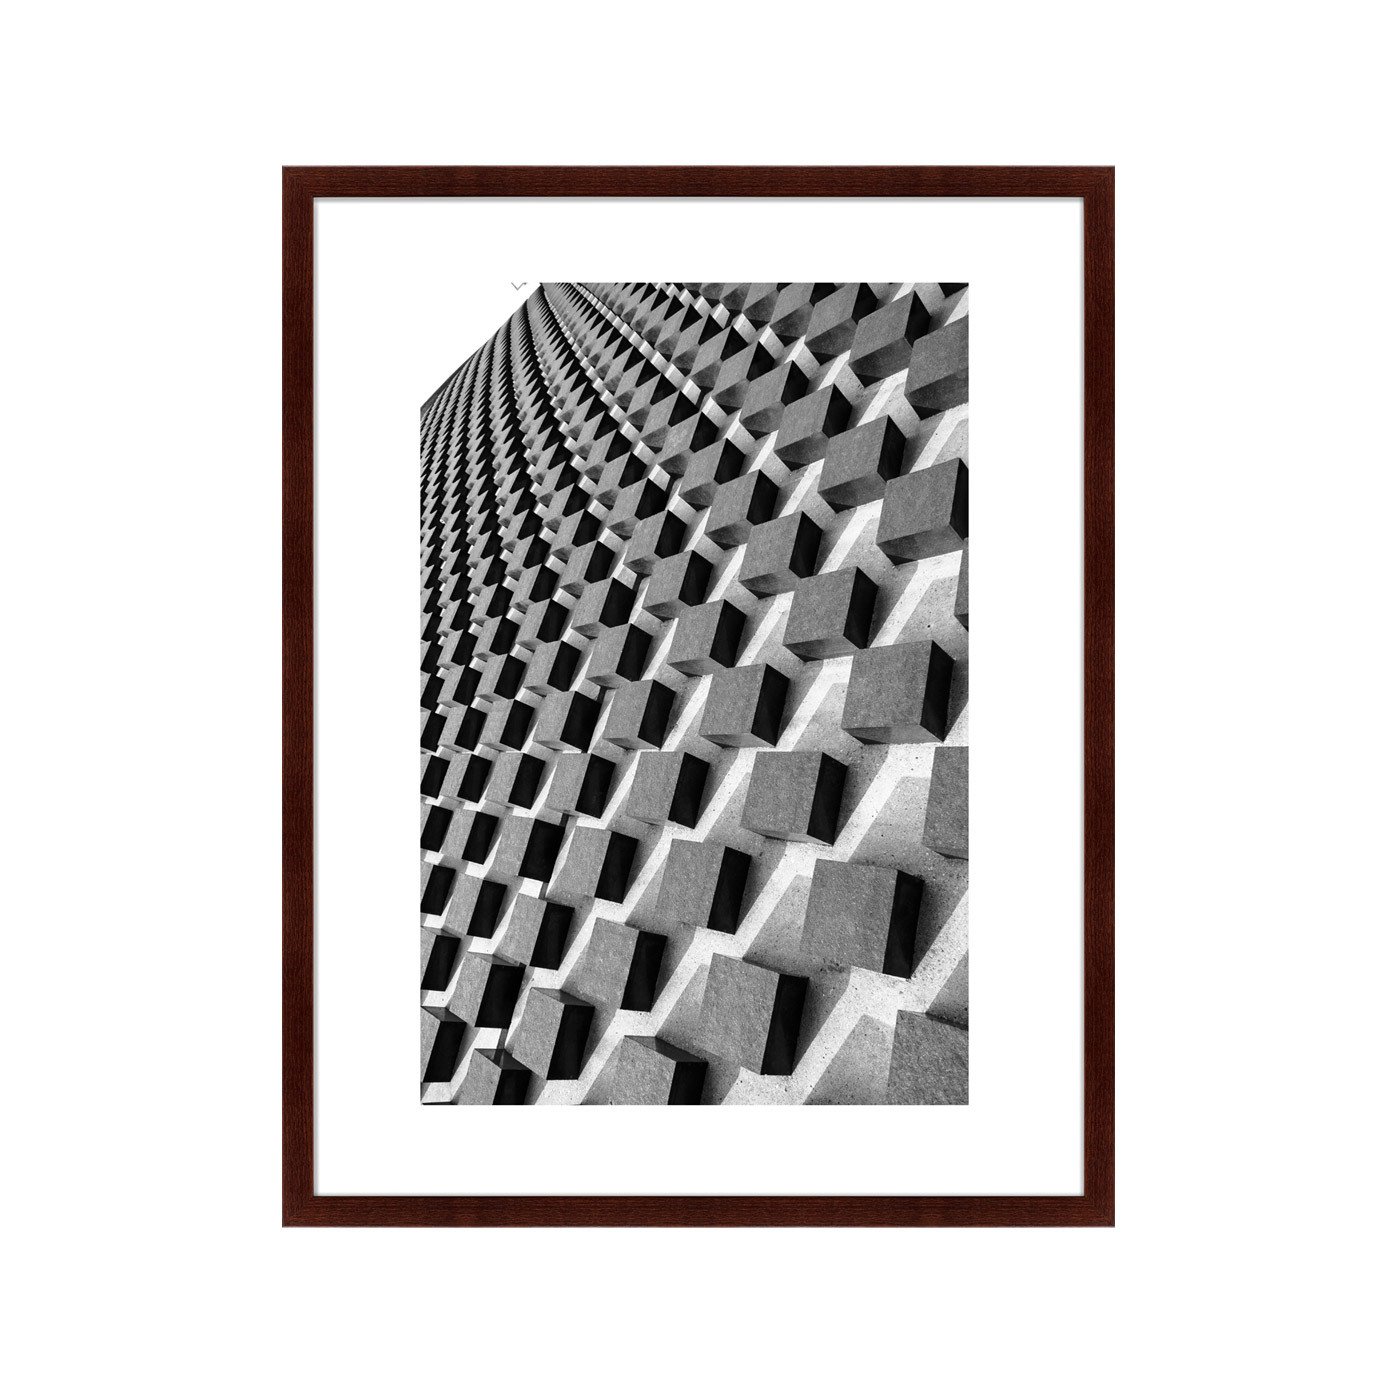 {} Картины в Квартиру Картина Свет и Форма (79х100 см) картины в квартиру картина вектор 79х100 см